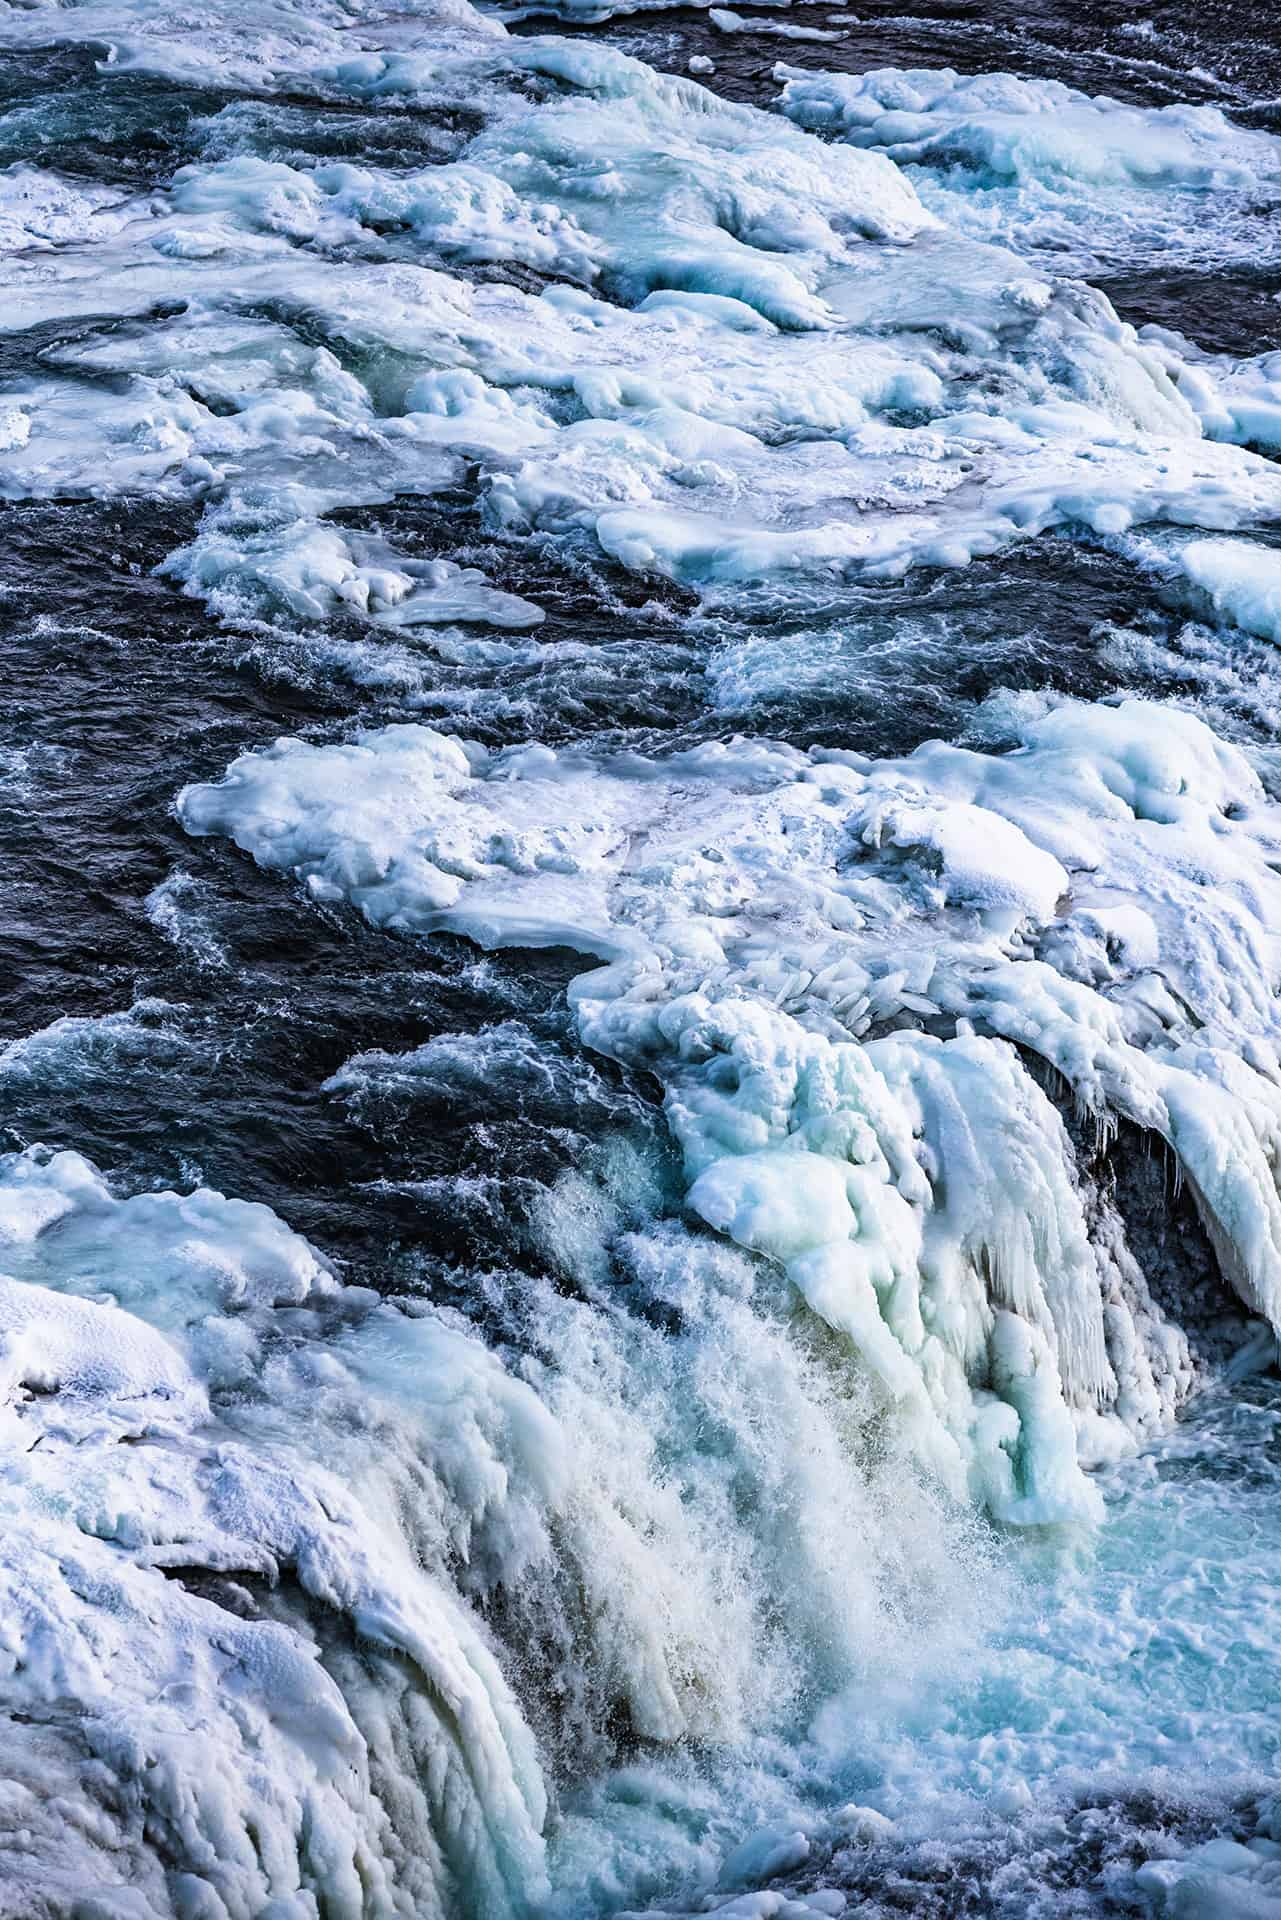 artnorama - White Water Fall